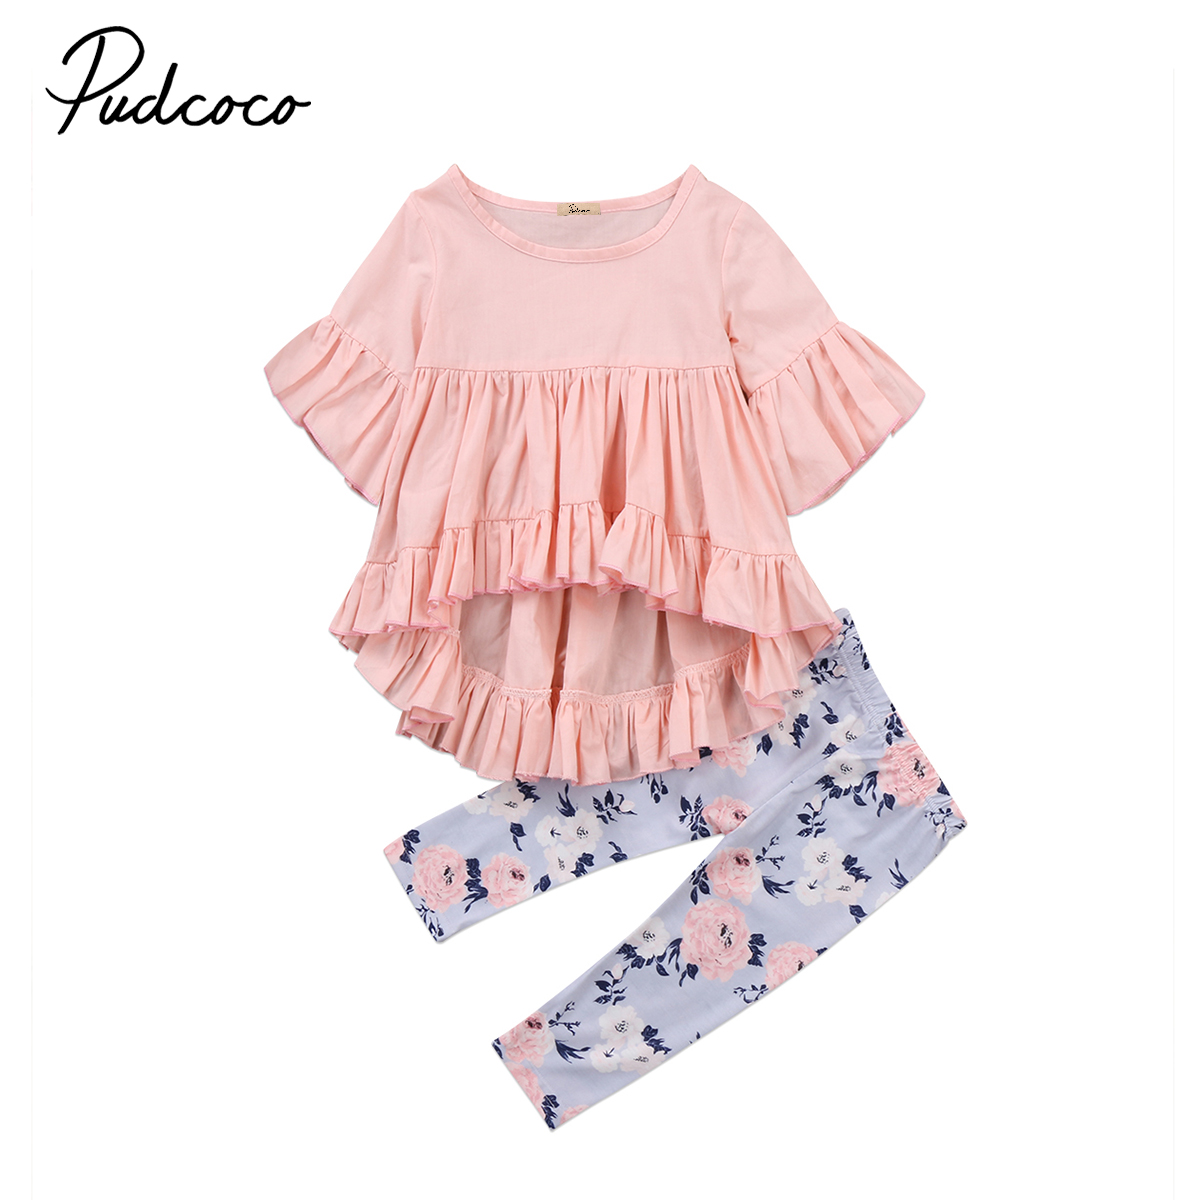 Long Pants Outfits Clothes Set 2pcs Toddler Kid Girls Long Sleeve T-shirt Tops